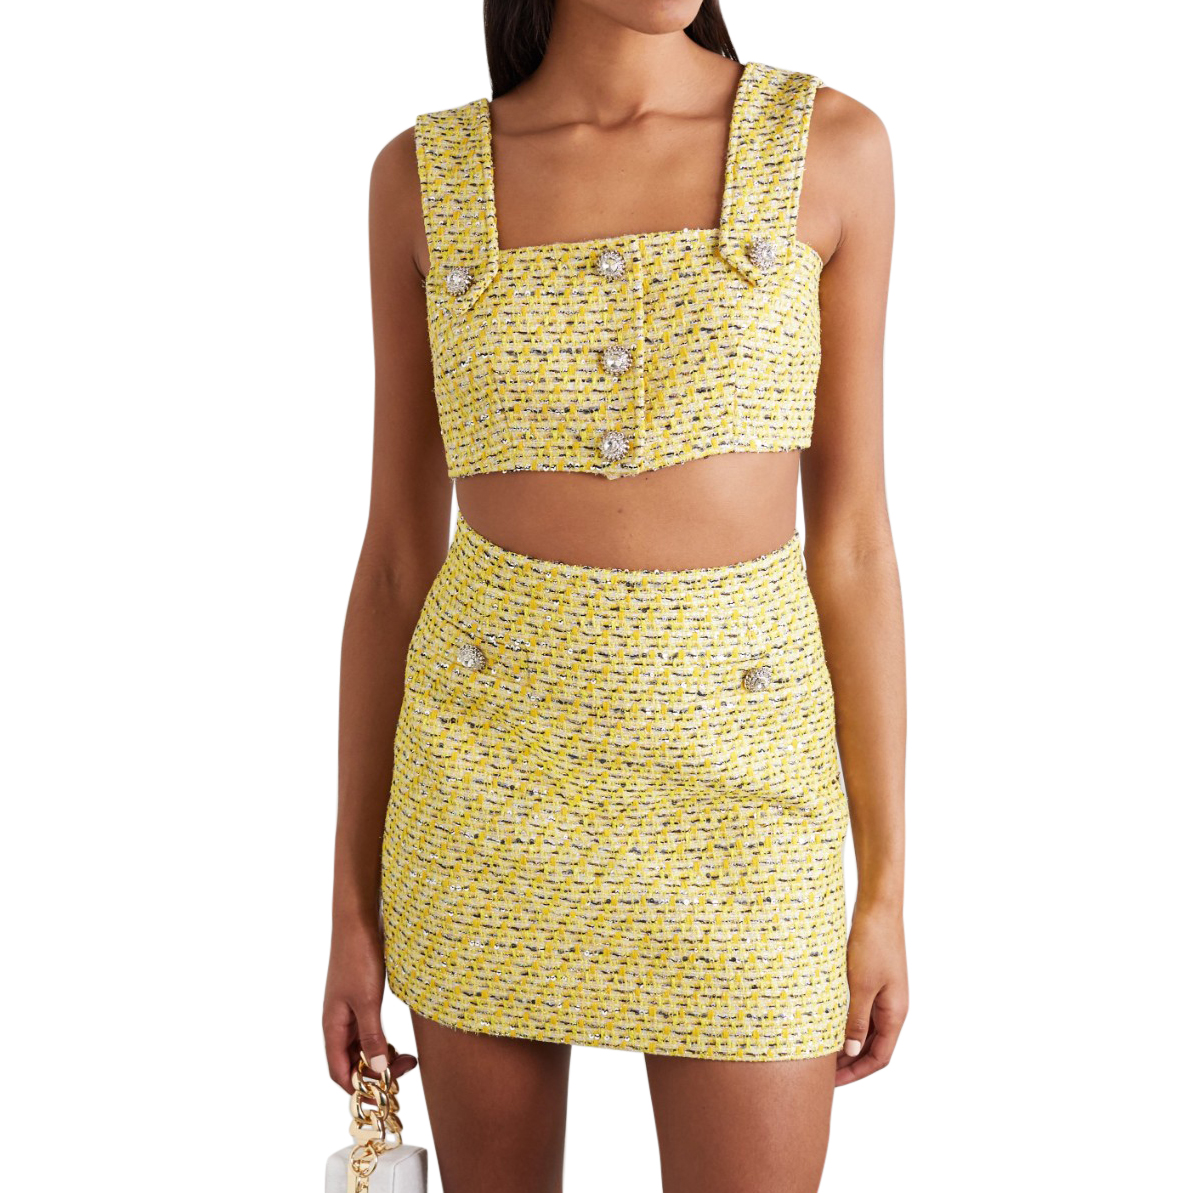 Alessandra Rich Yellow Lurex Tweed Crop Top